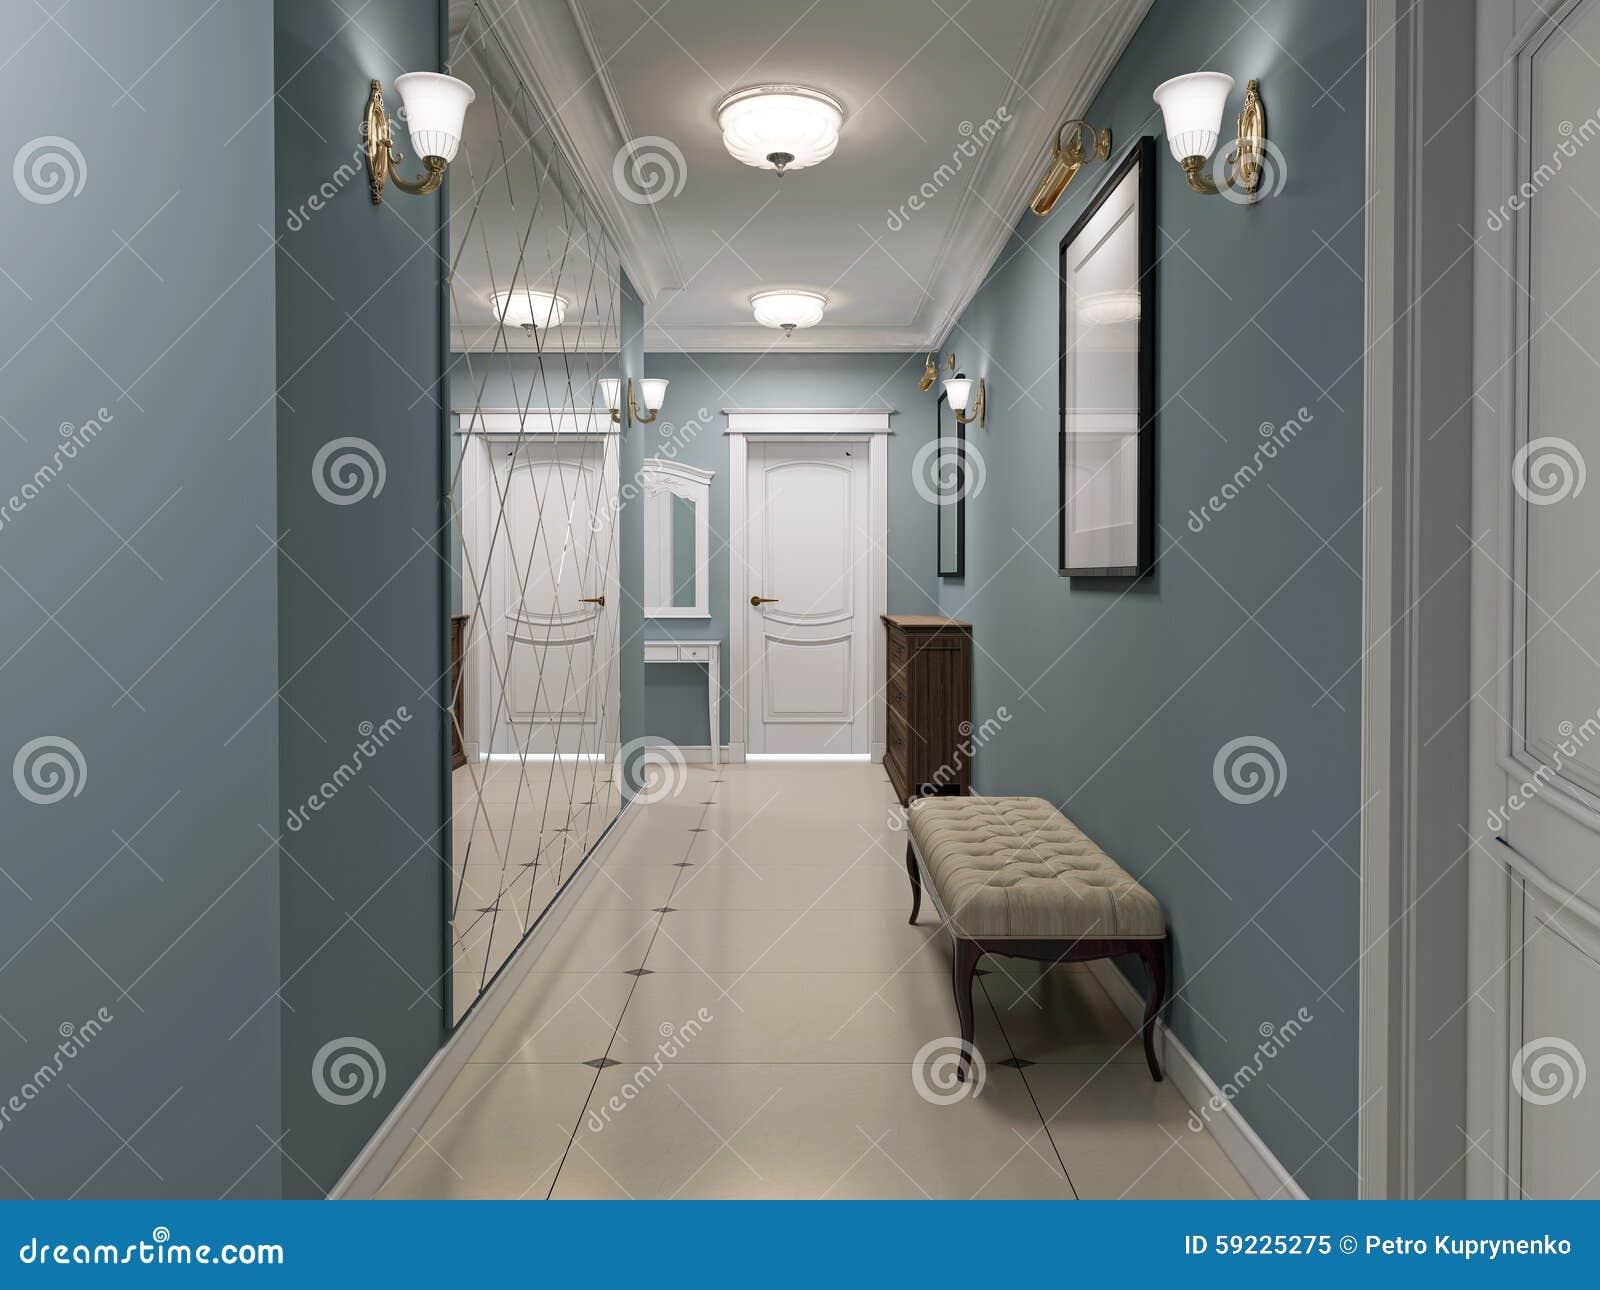 Luxury Entrance Hall Art Deco Design Stock Photo - Image: 59225275